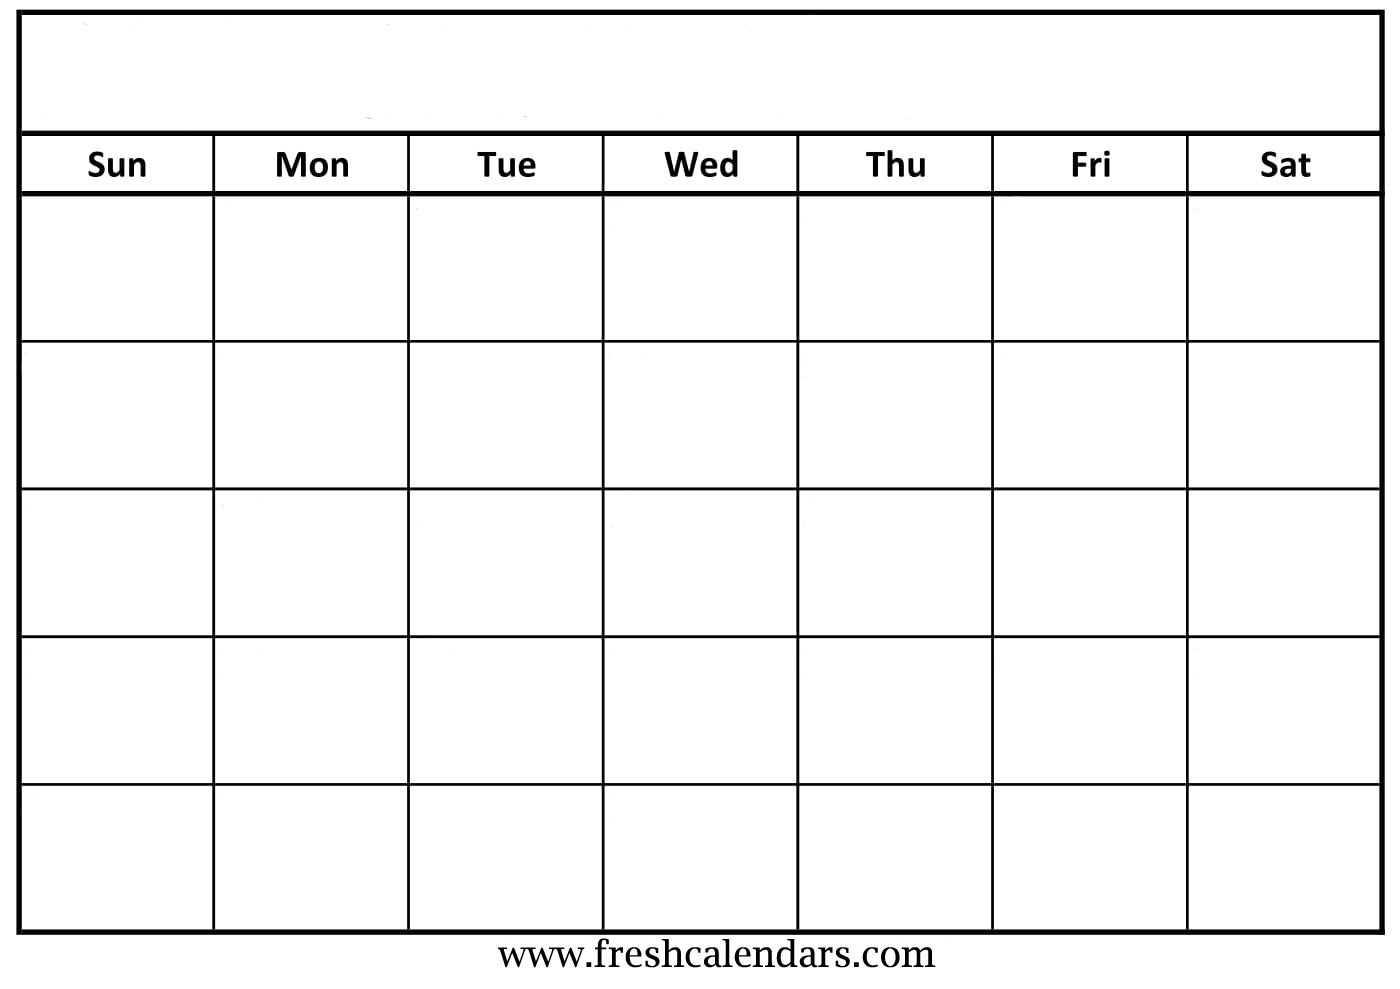 30 Blank Calendar Template 2019 | Andaluzseattle Template For Blank Calender Template